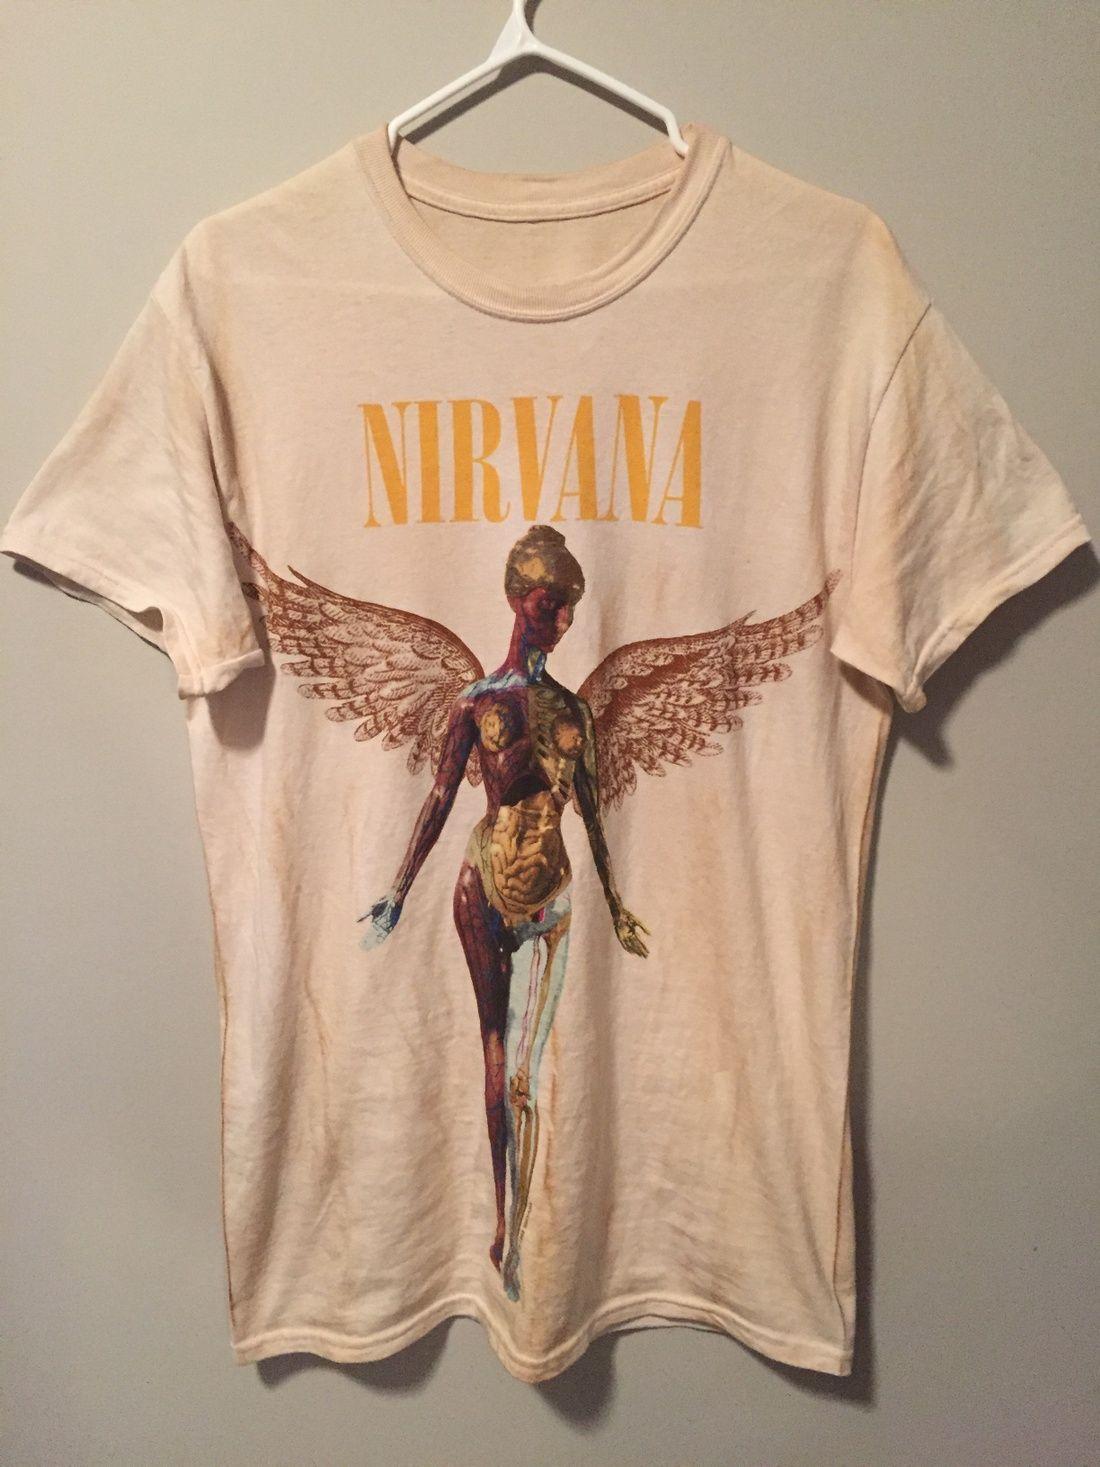 a619855b Nirvana Vintage Band Tee Rock Tees, Rock T Shirts, Mens Tee Shirts, Grunge